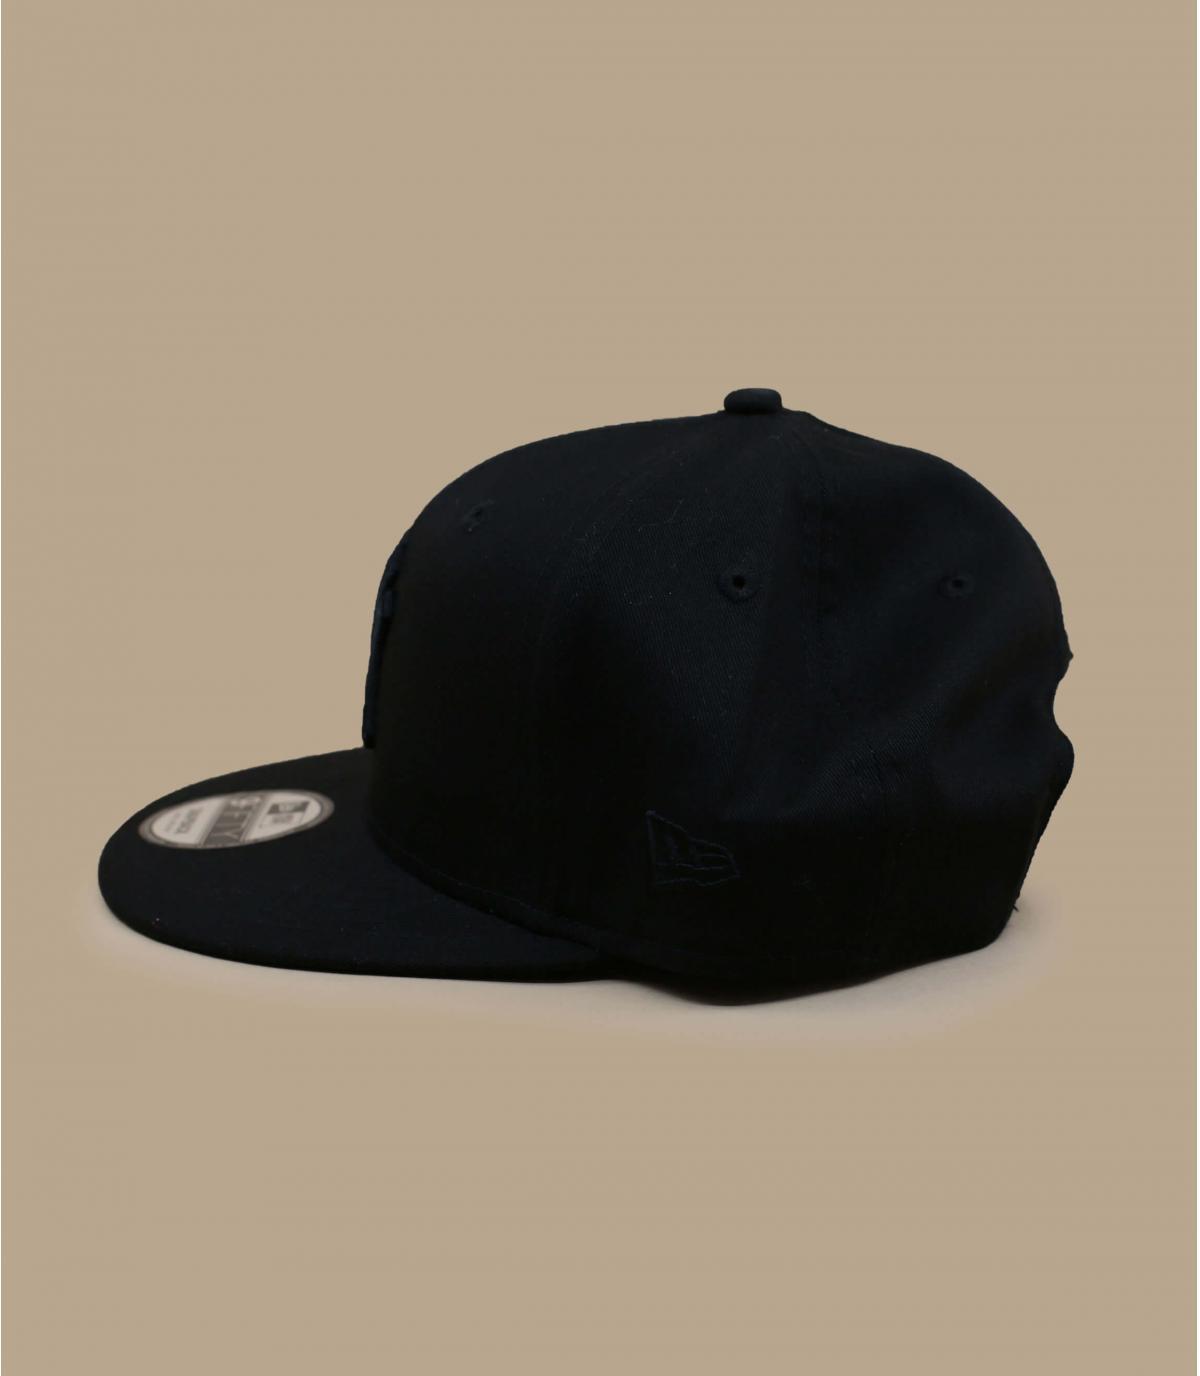 Details Snapback Cap NY MLB black black - Abbildung 3